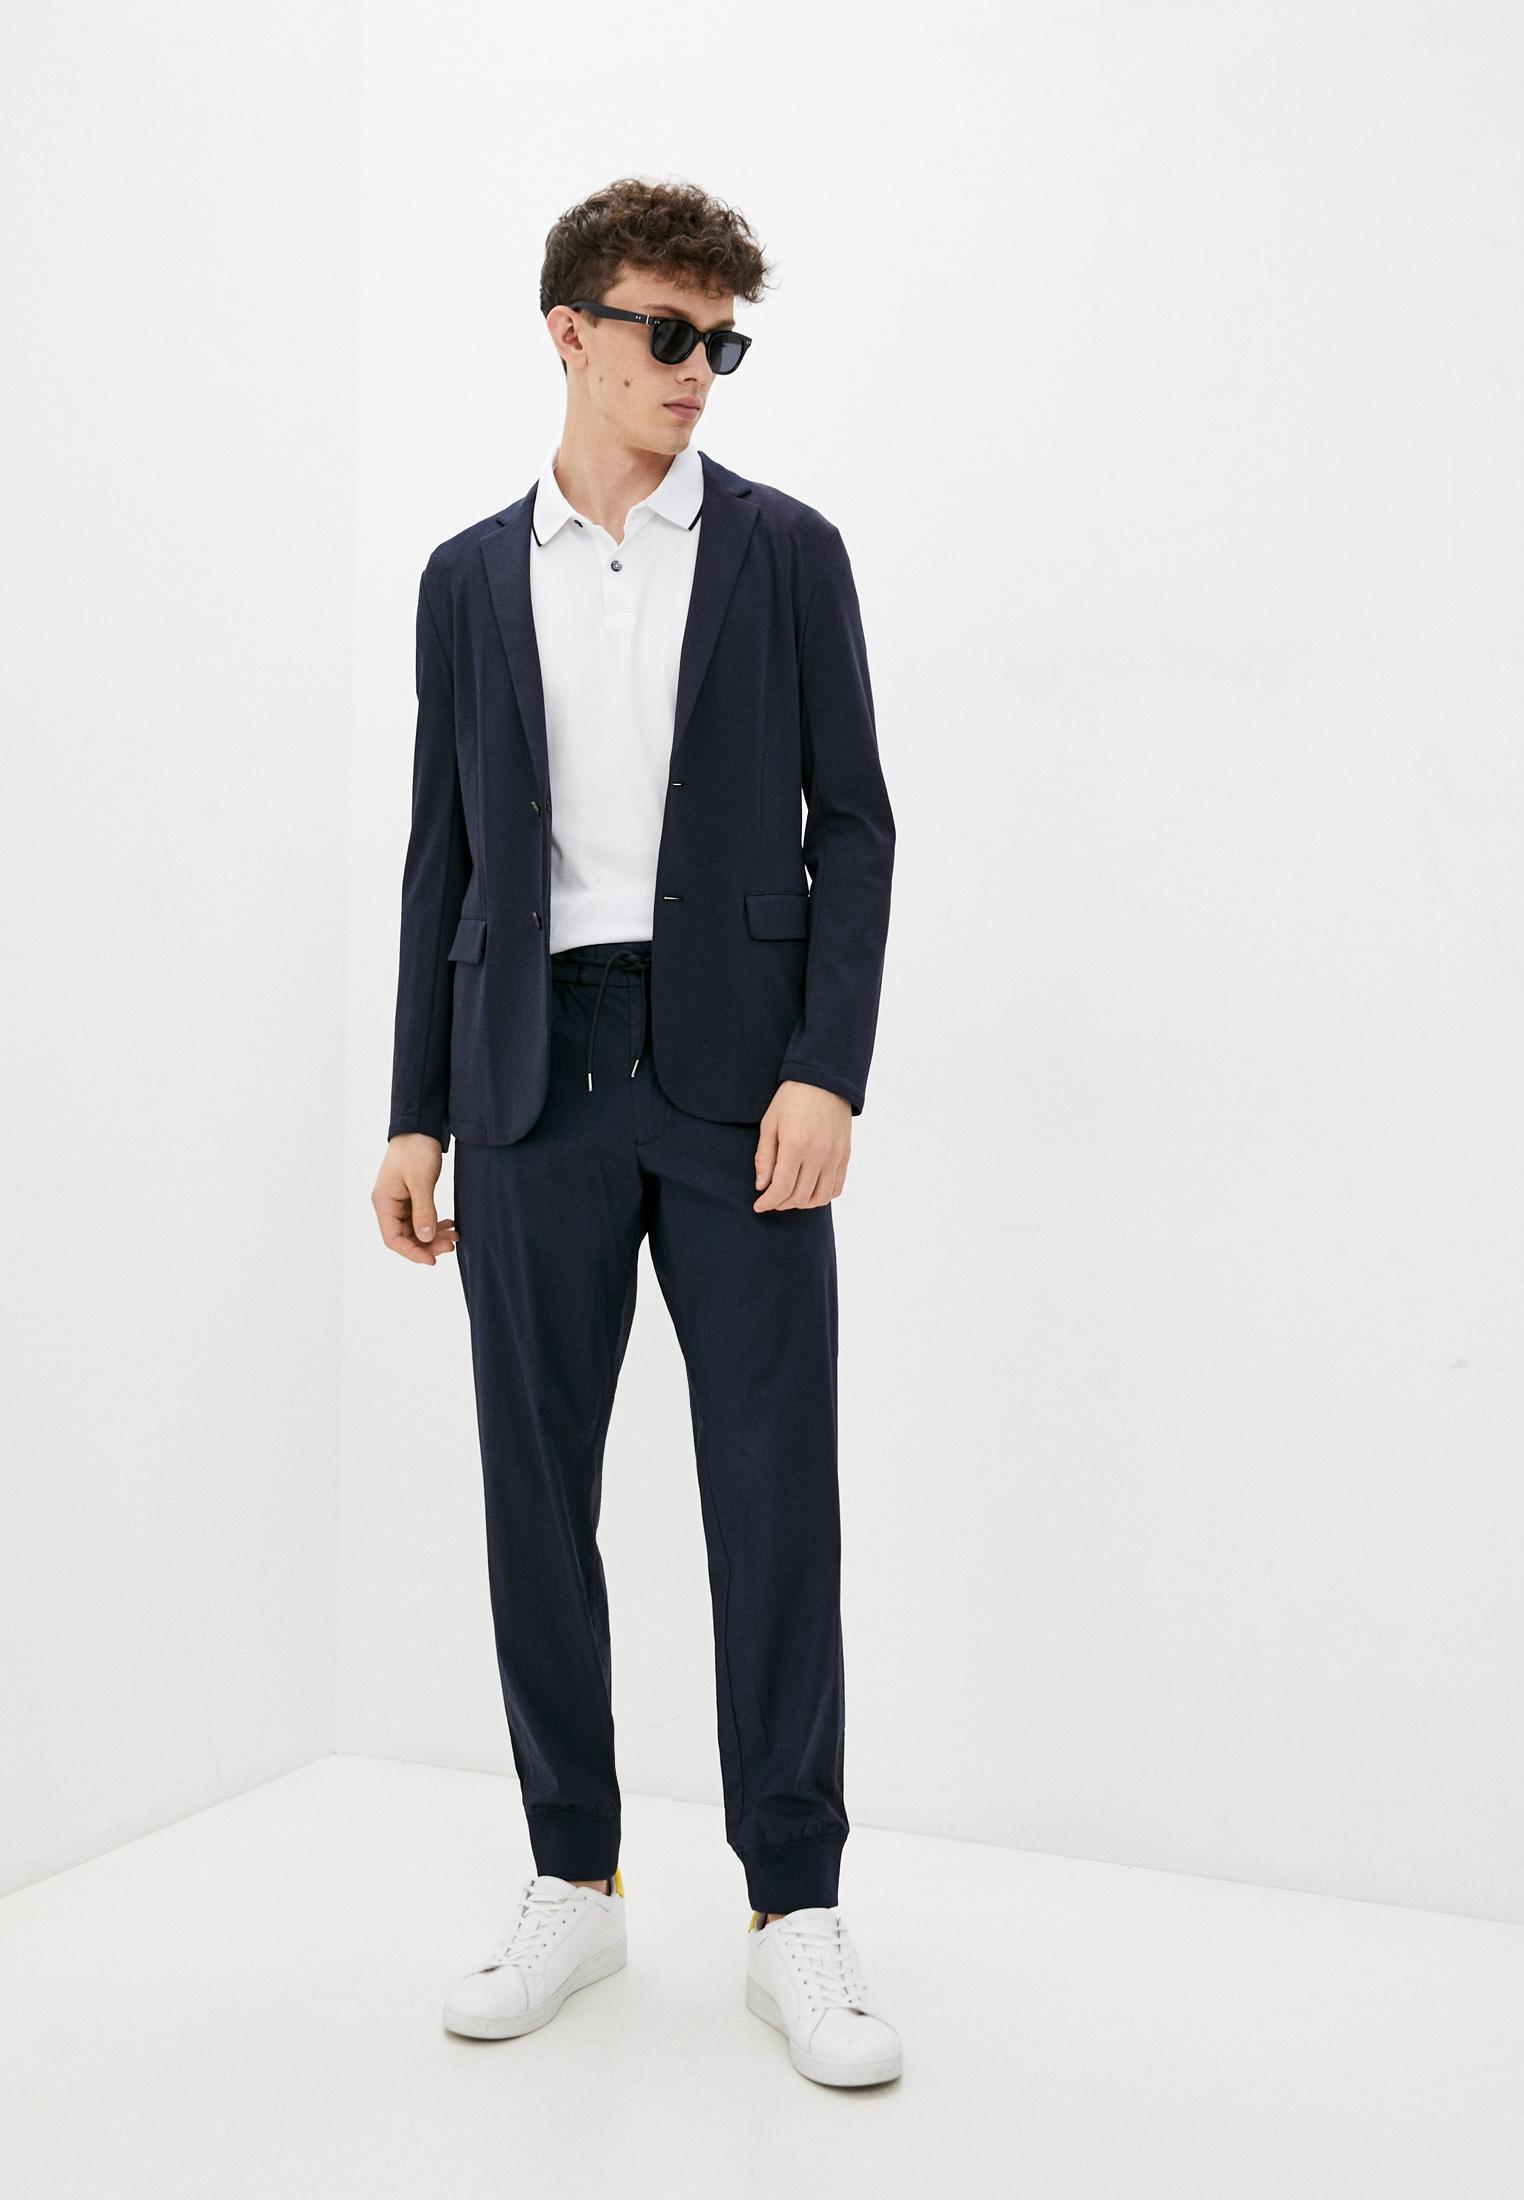 Мужской пиджак Armani Jeans (Армани Джинс) 7V6GG8 6JPRZ: изображение 3